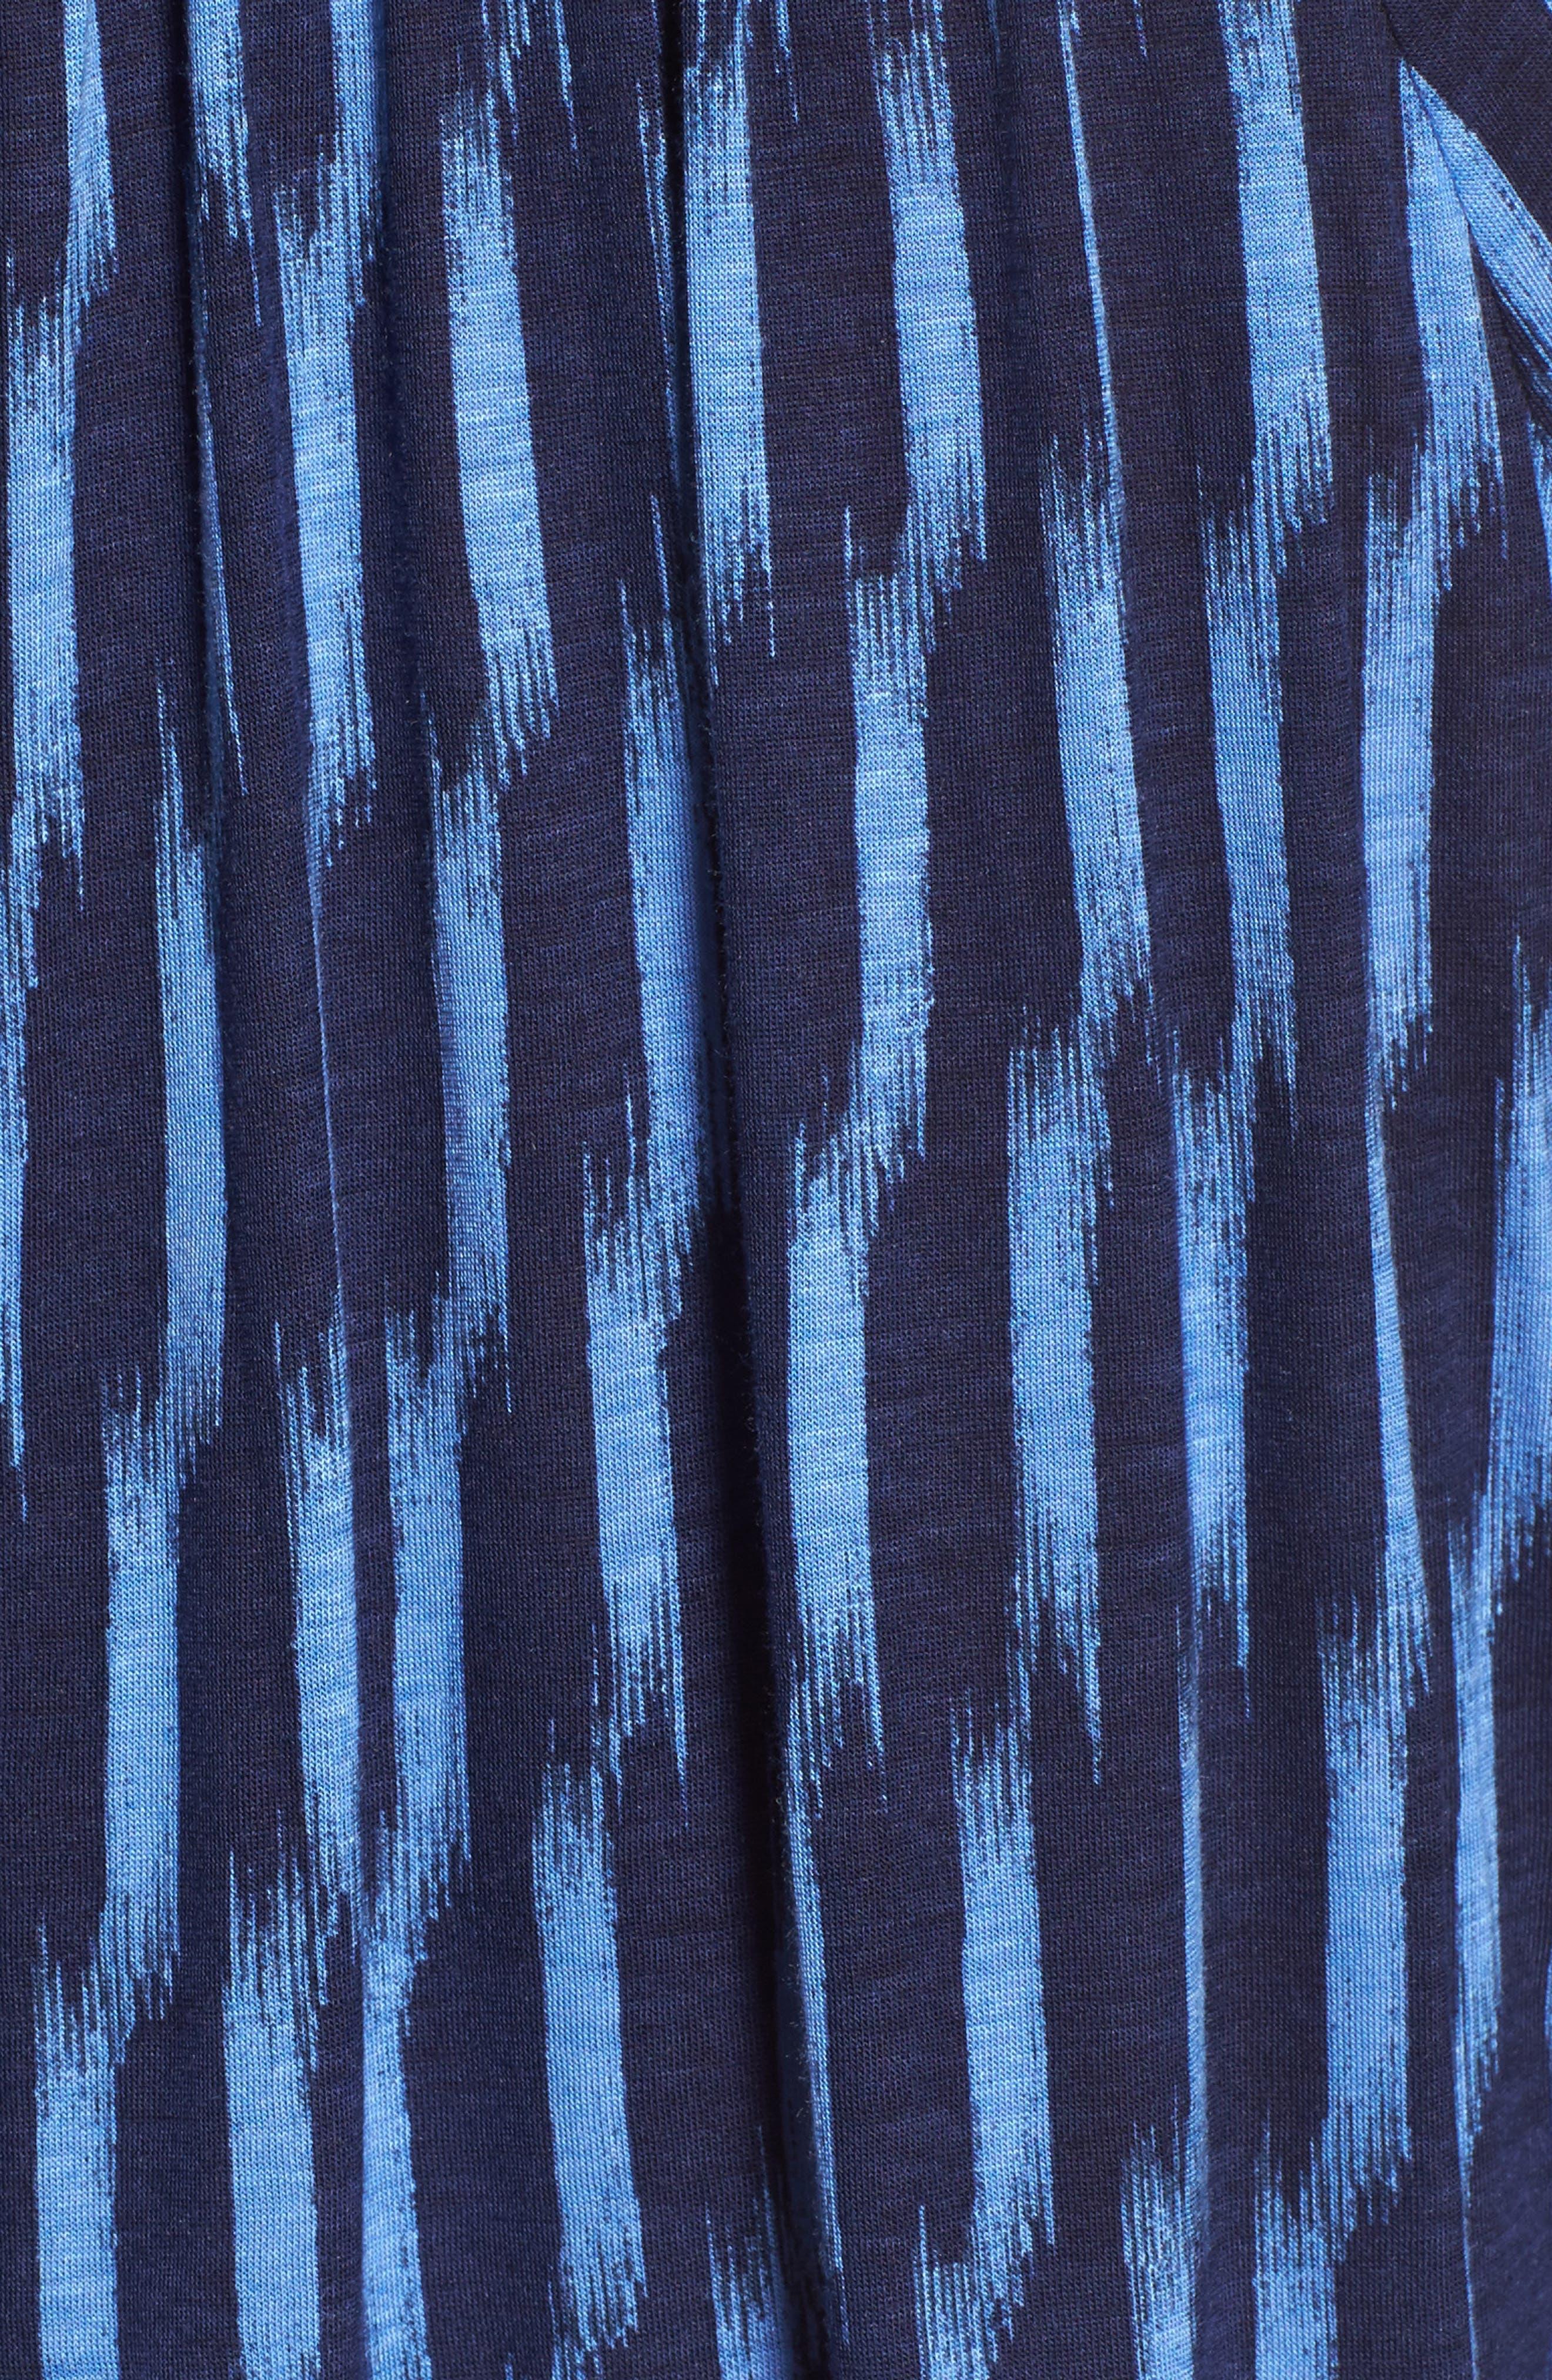 Sari Print Peasant Top,                             Alternate thumbnail 5, color,                             Oxford Blue/ True Navy